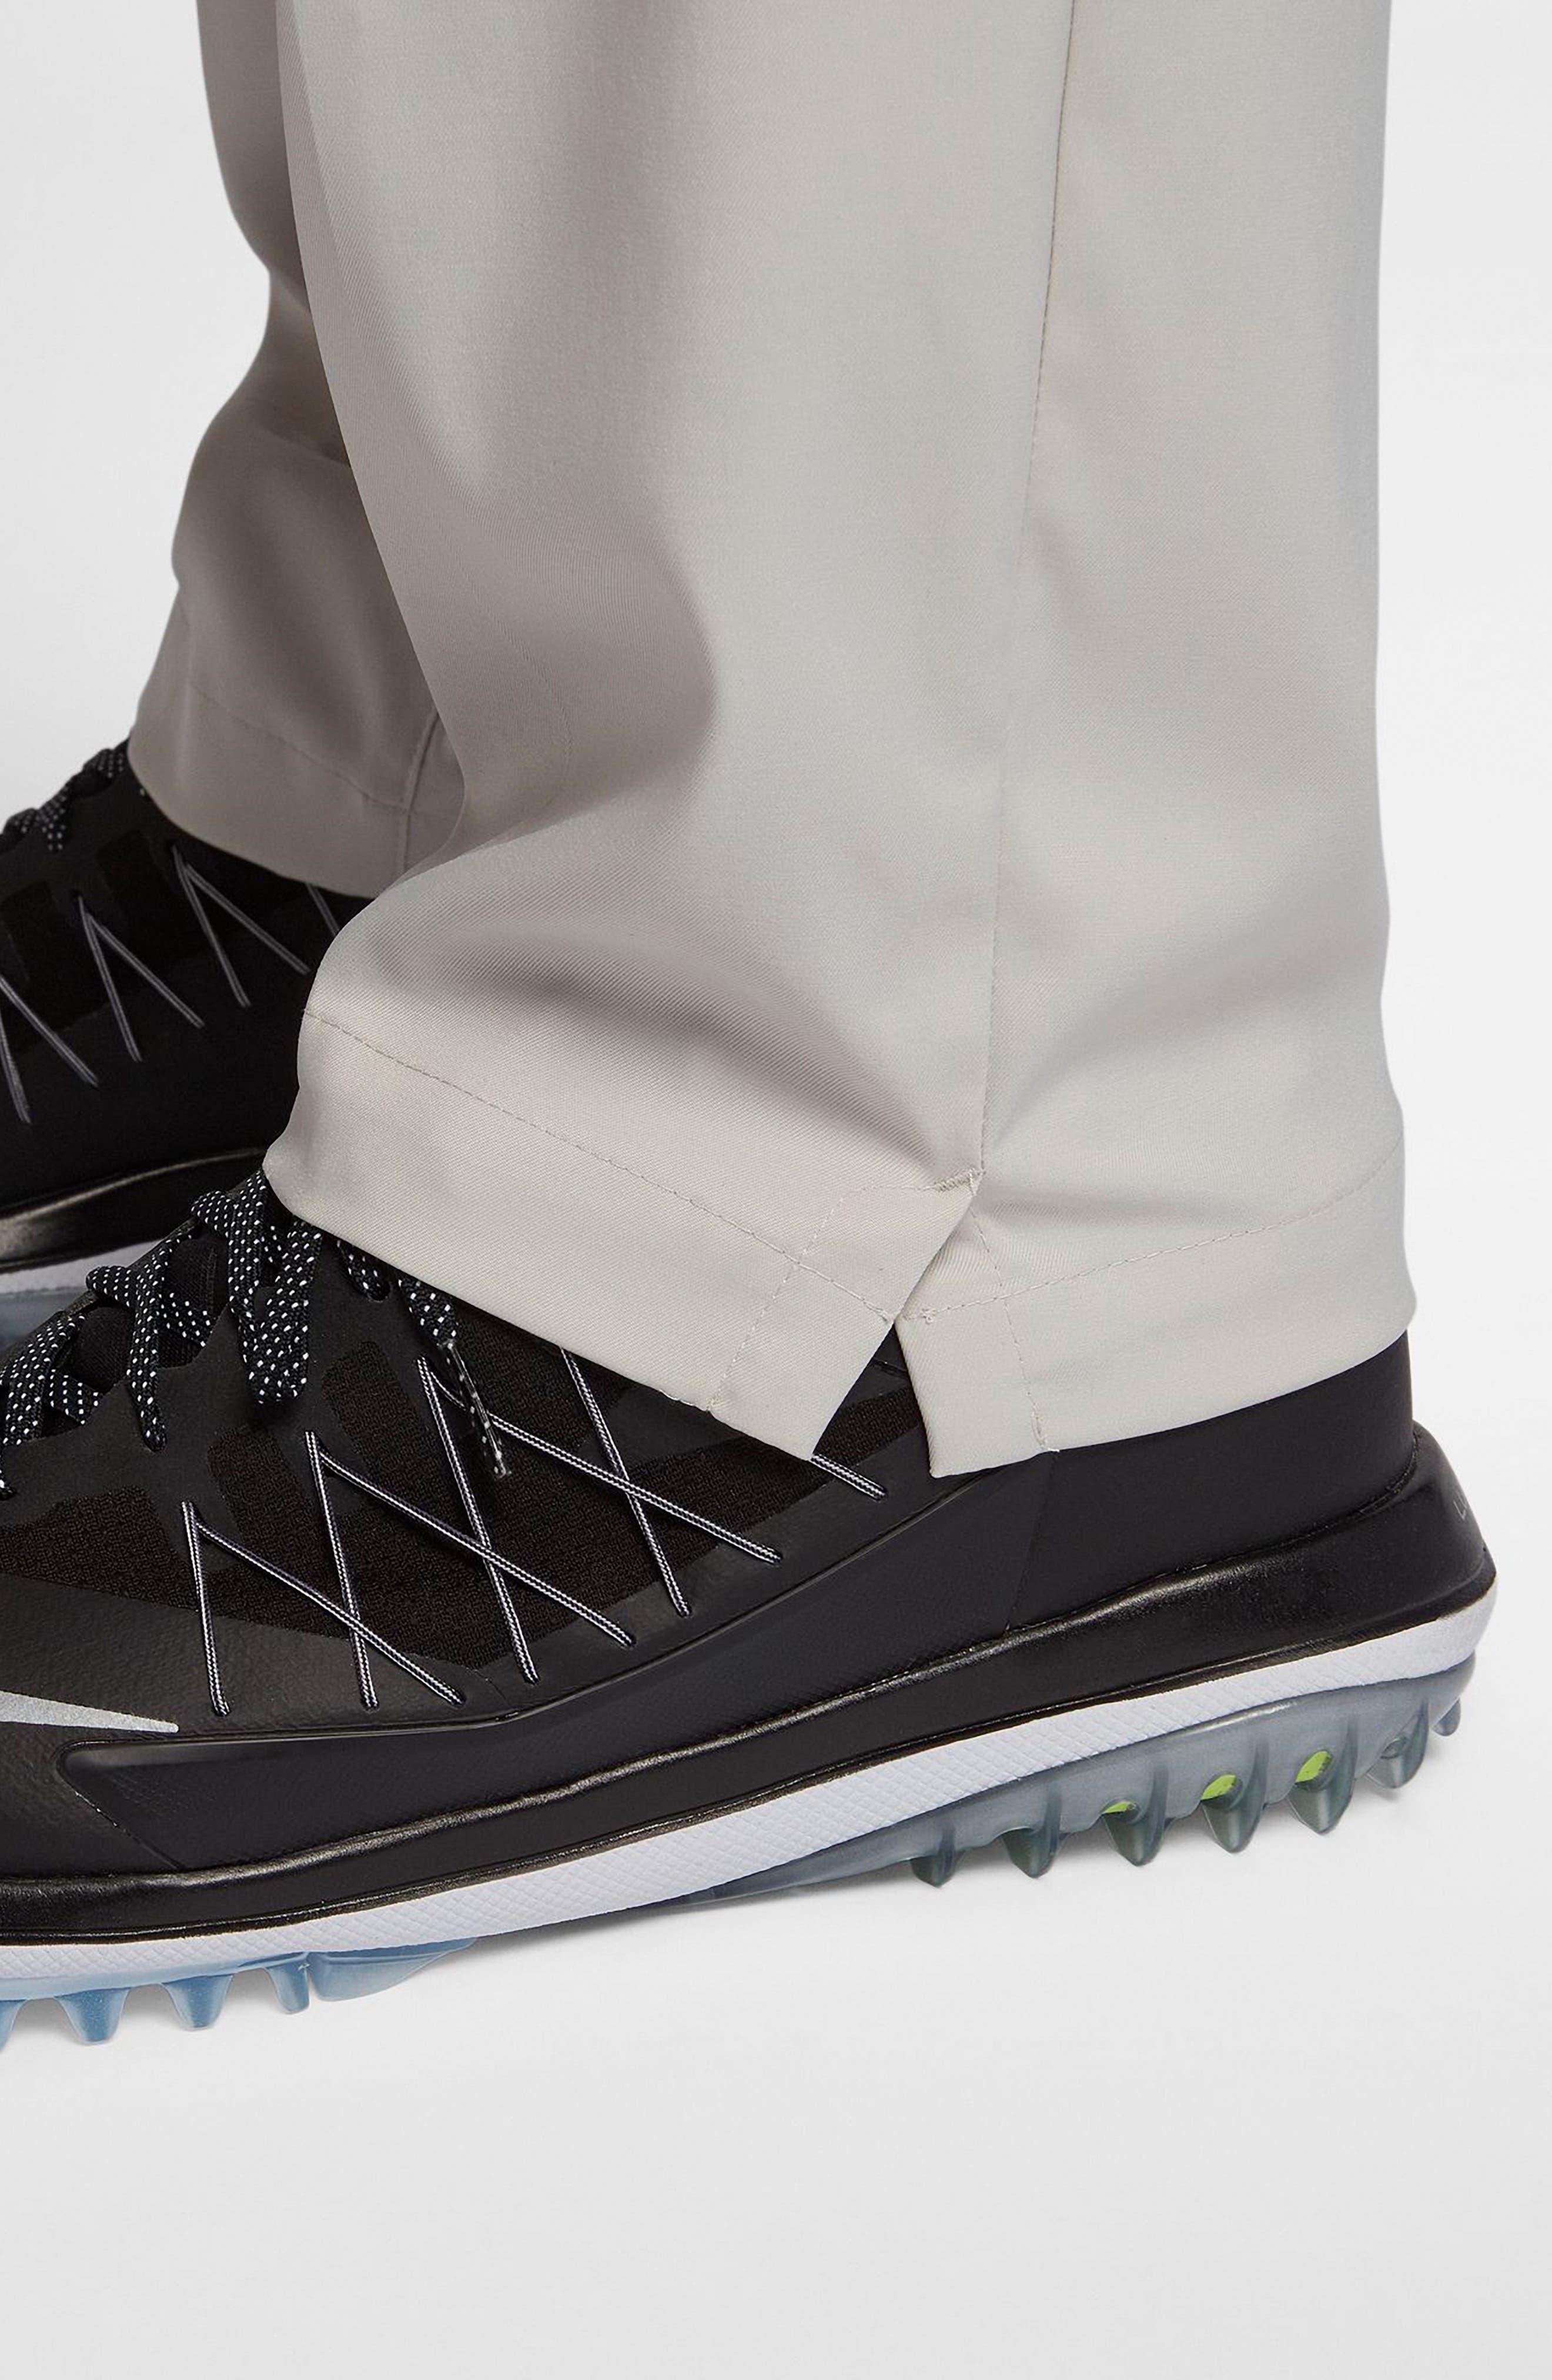 Flat Front Dri-FIT Tech Golf Pants,                             Alternate thumbnail 7, color,                             LIGHT BONE/ LIGHT BONE